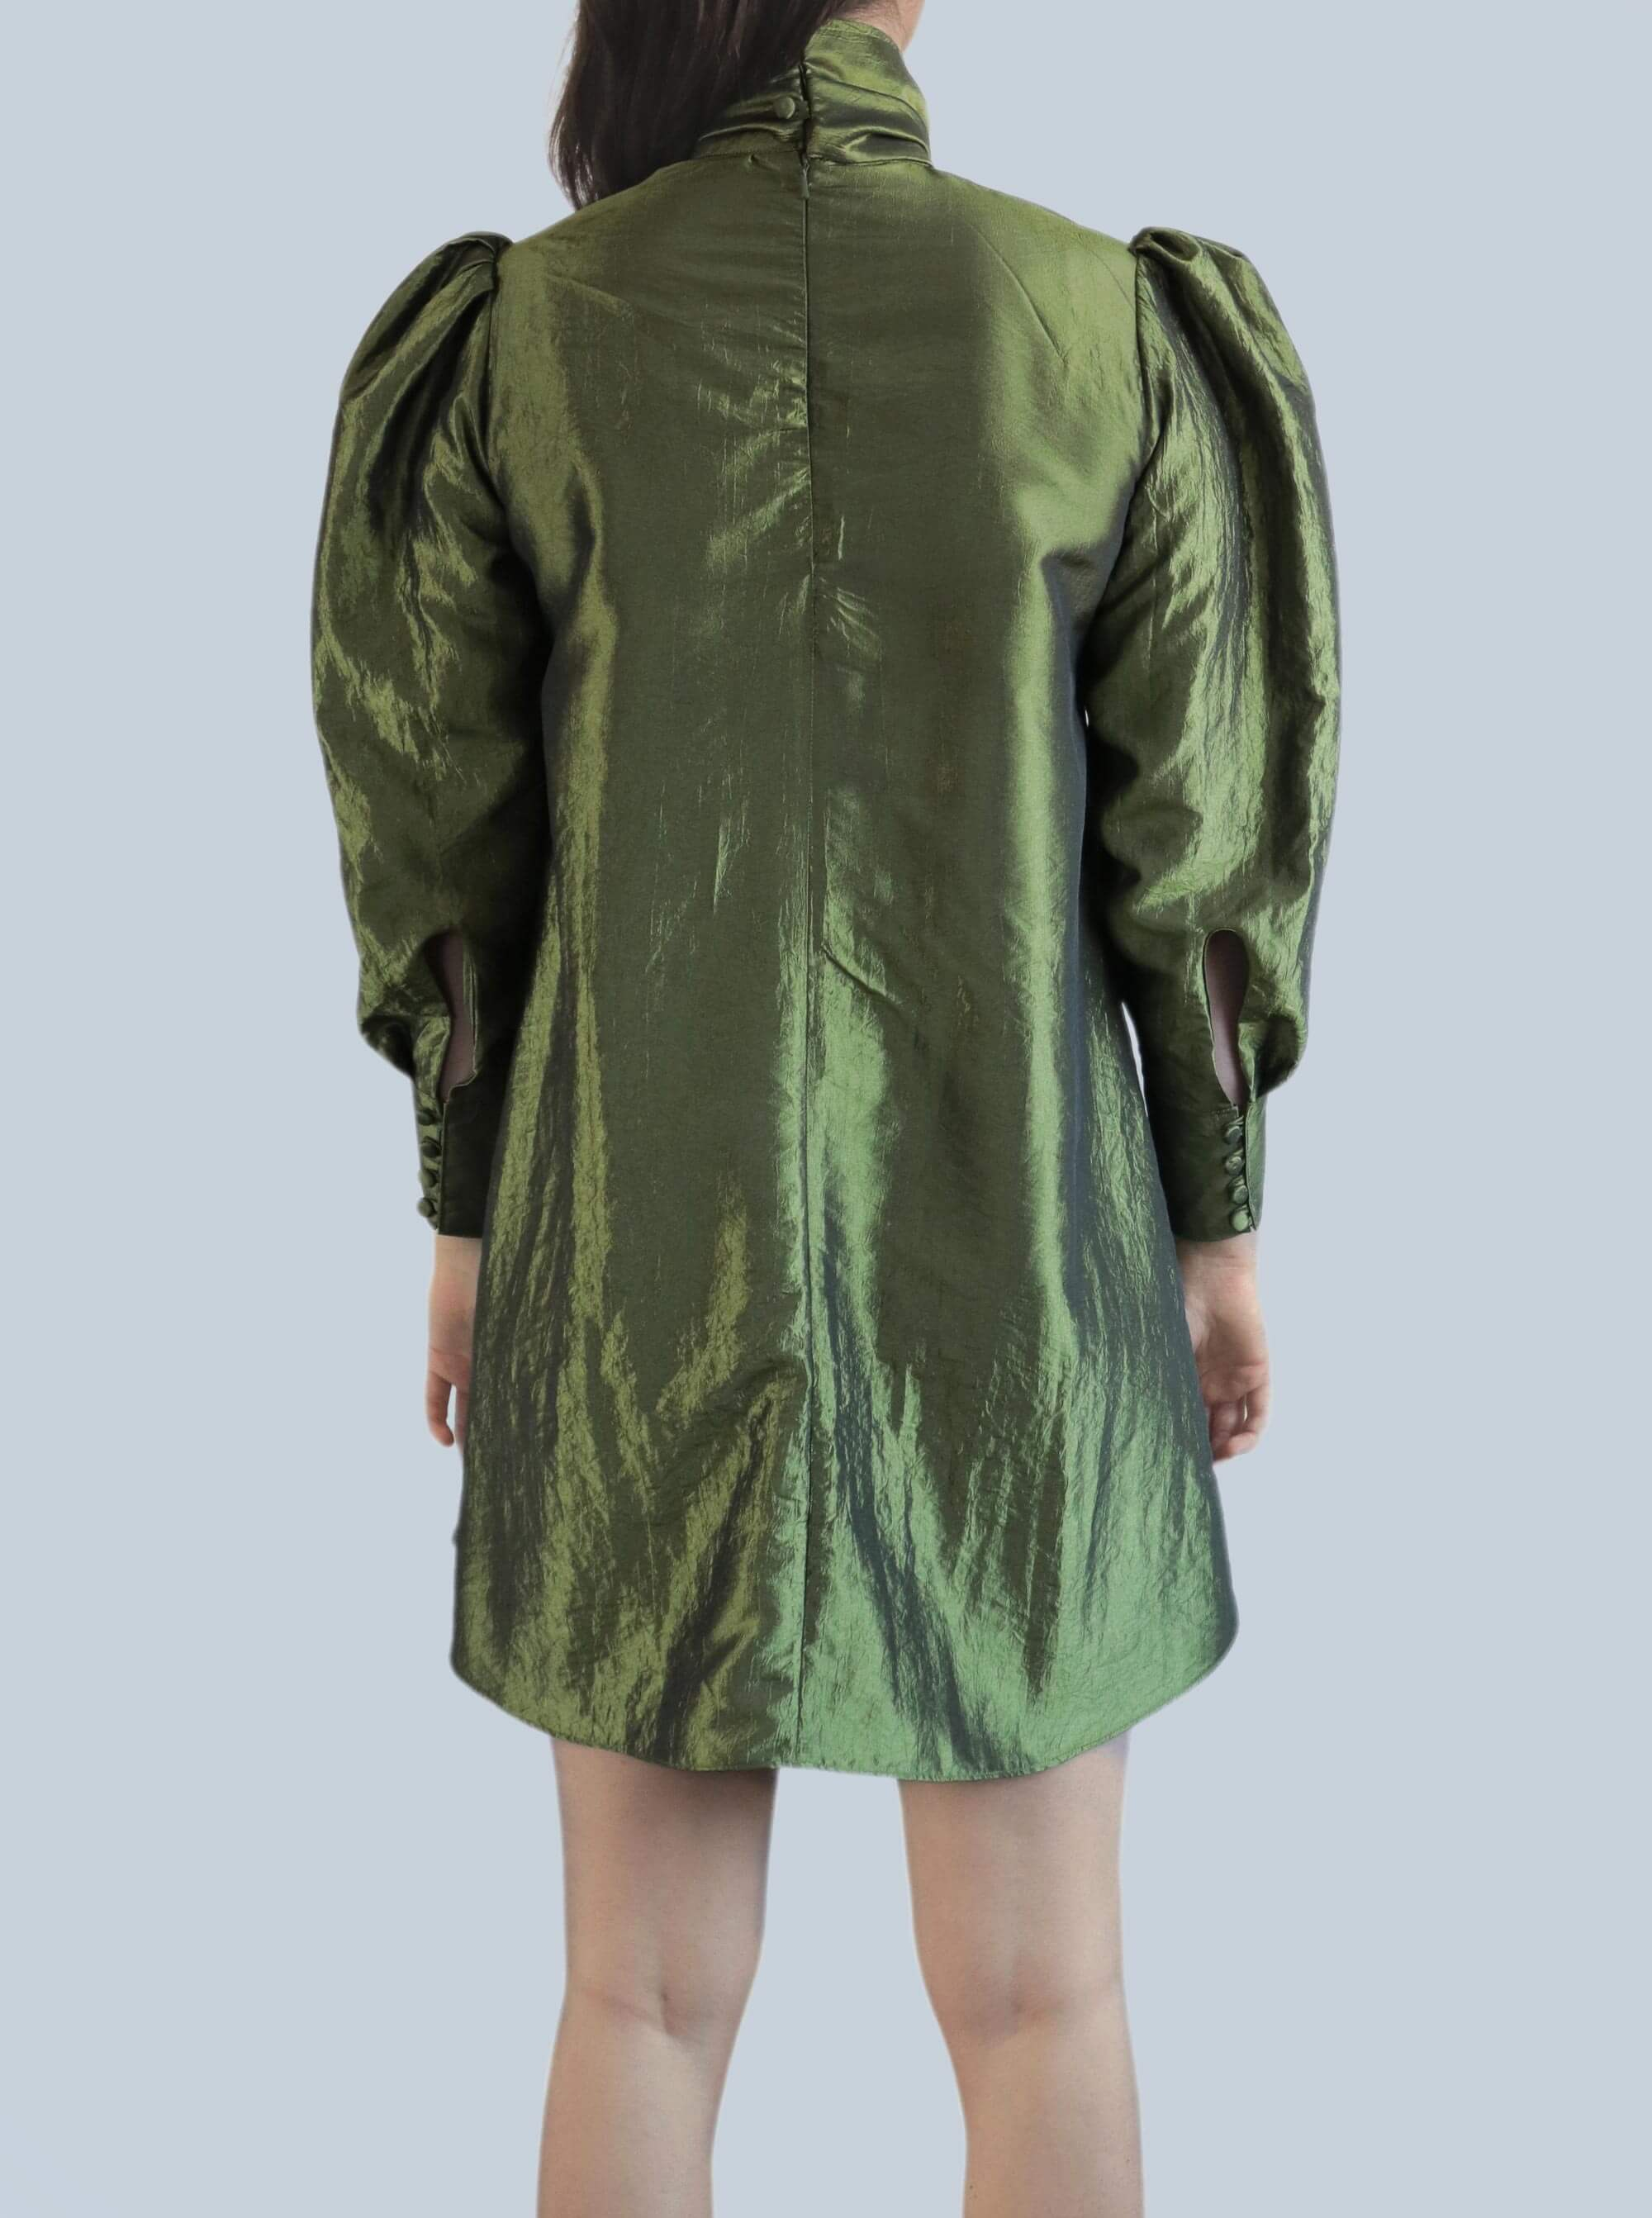 Rose Lee Dress in Green